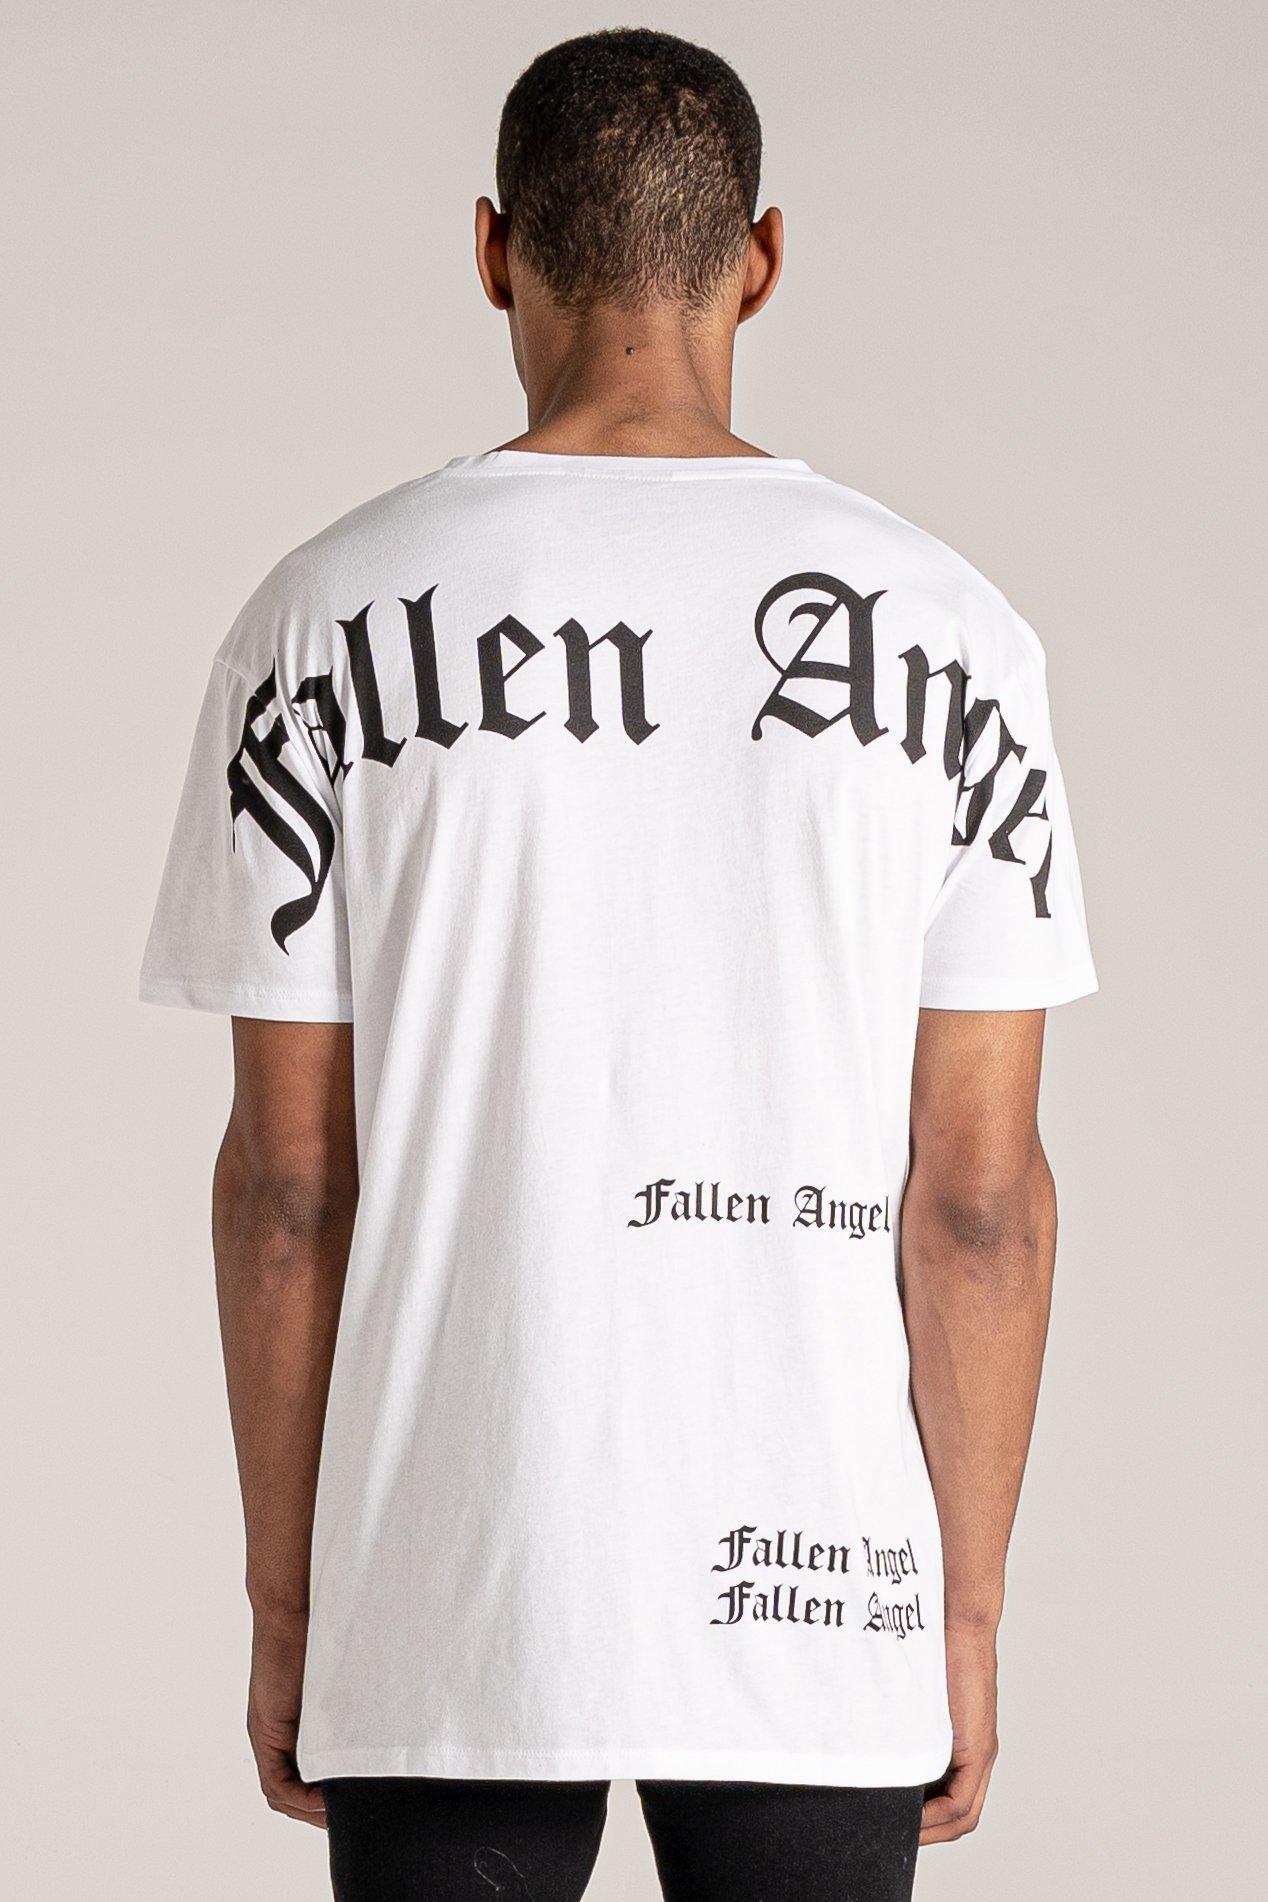 Quake Oversized Fallen Angel Logo Print Men's T-Shirt - White, X-Large